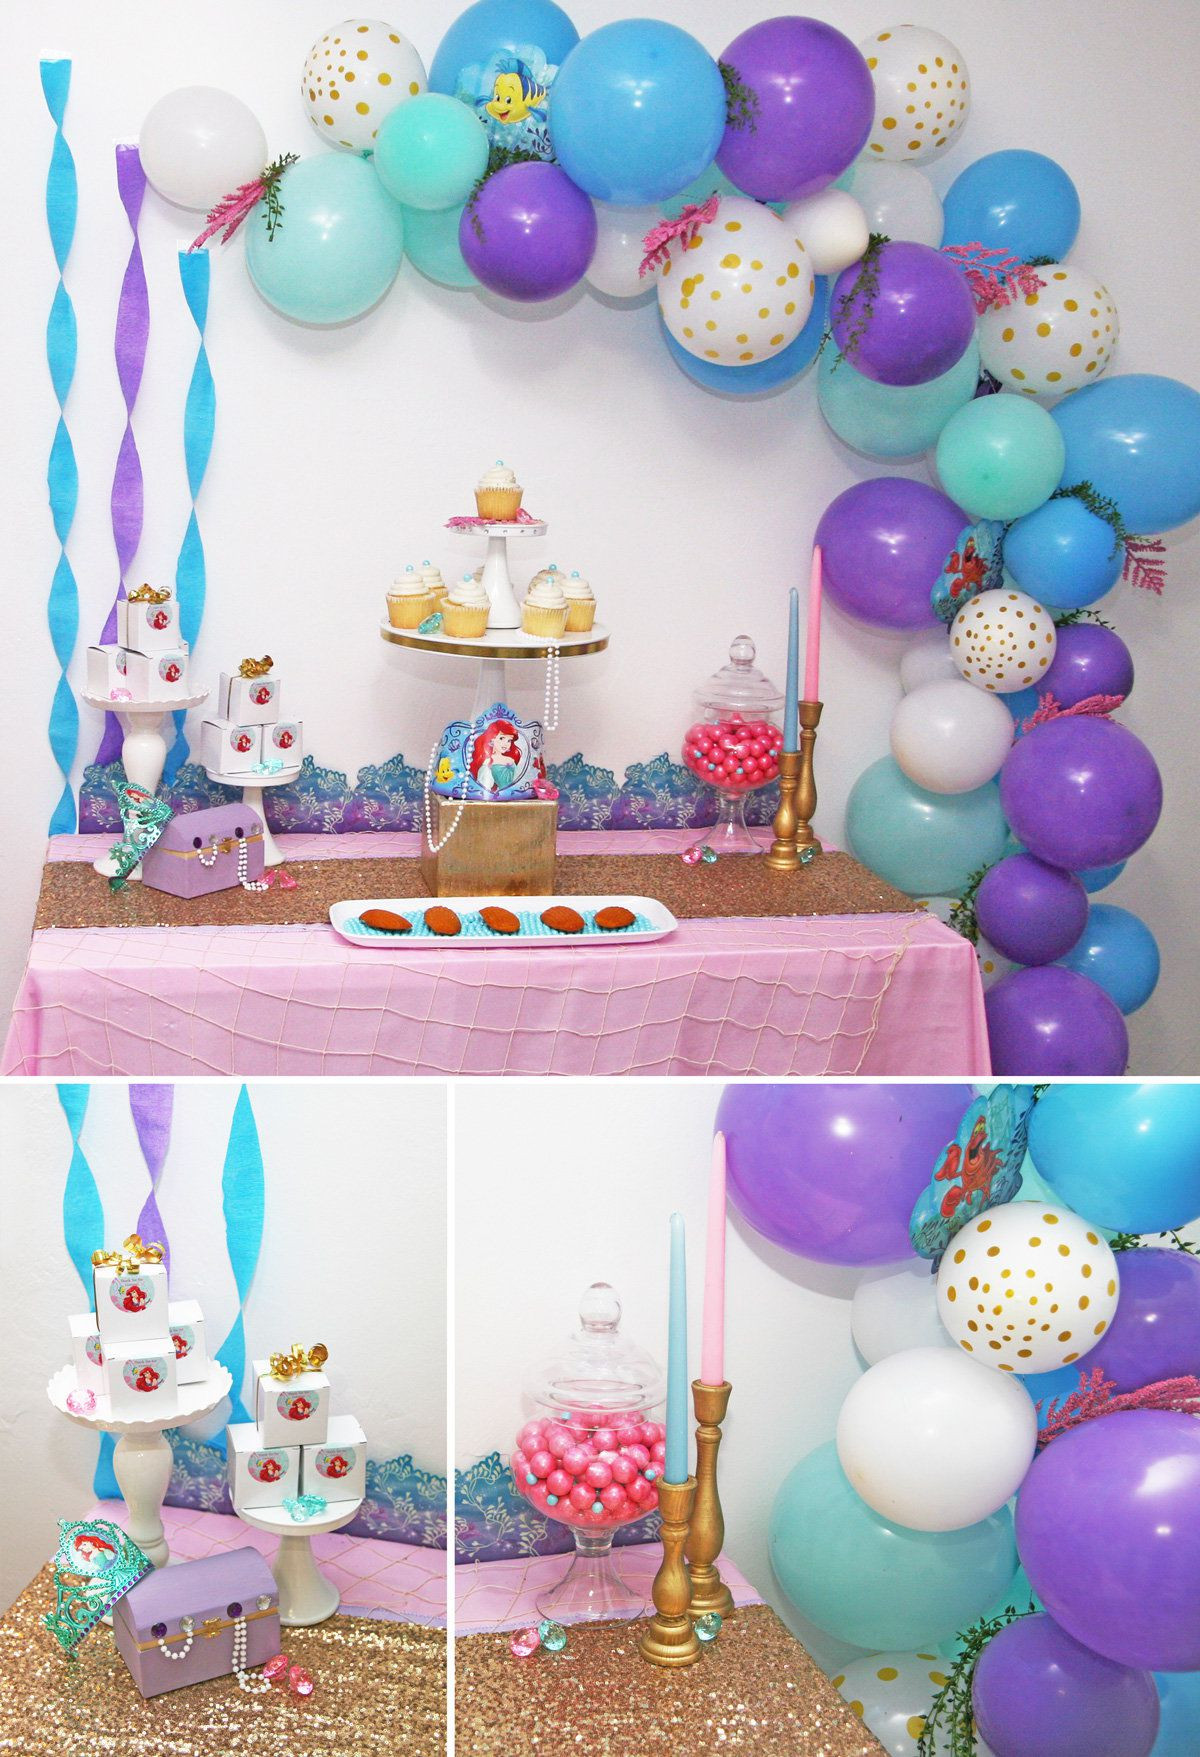 Little Mermaid Party Decoration Ideas  Little Mermaid Party Ideas